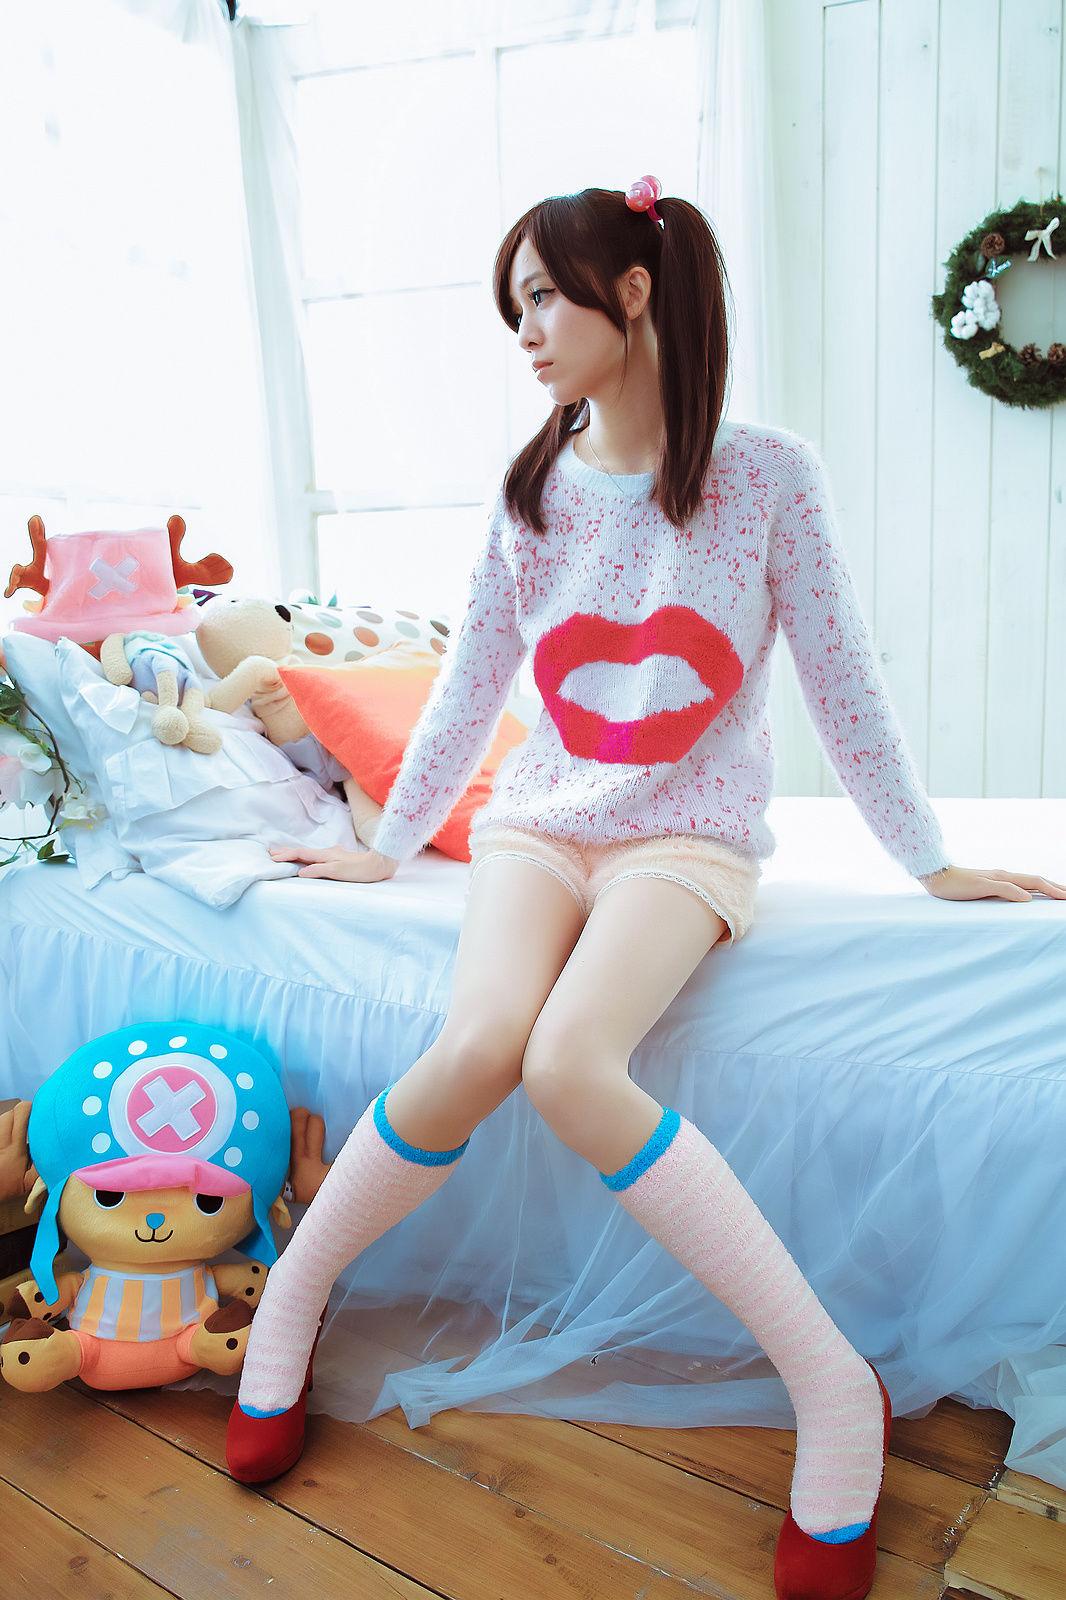 VOL.383 [台湾正妹]可爱萌女少女双马尾:林千如(腿模Anita)超高清个人性感漂亮大图(19P)